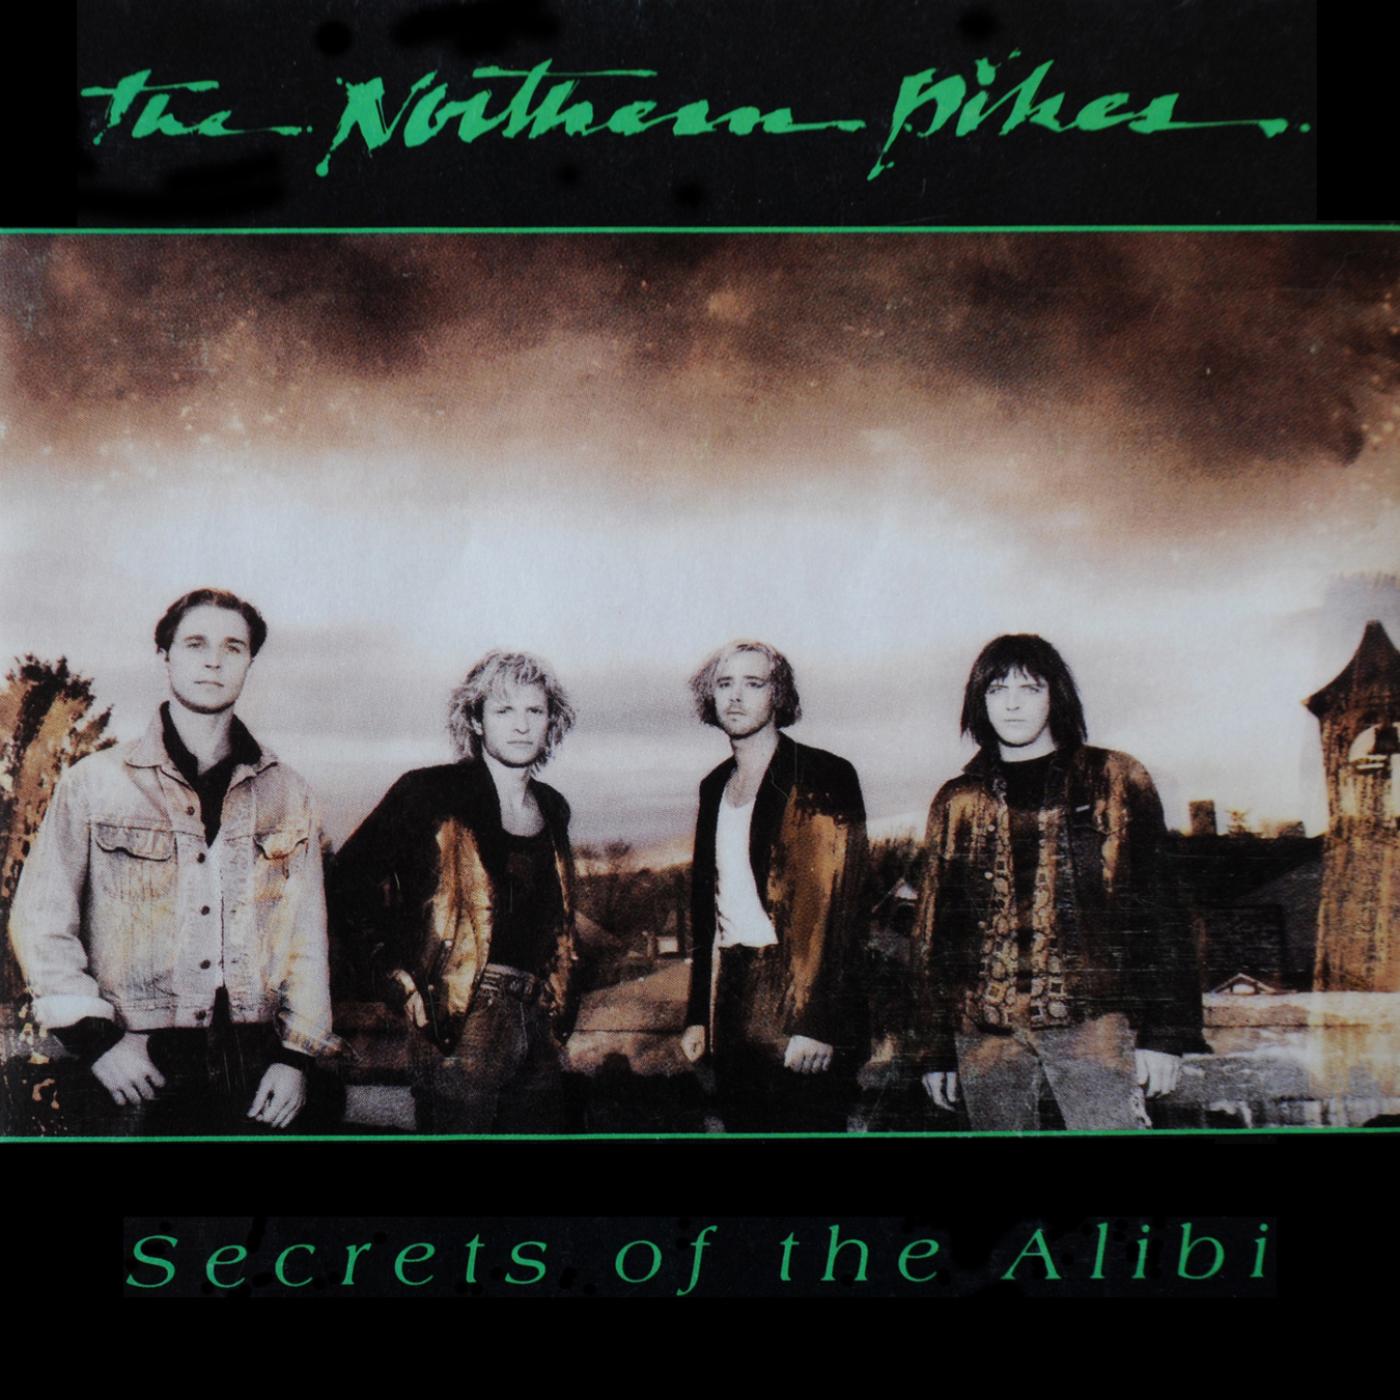 Secrets Of The Alibi - August 1988